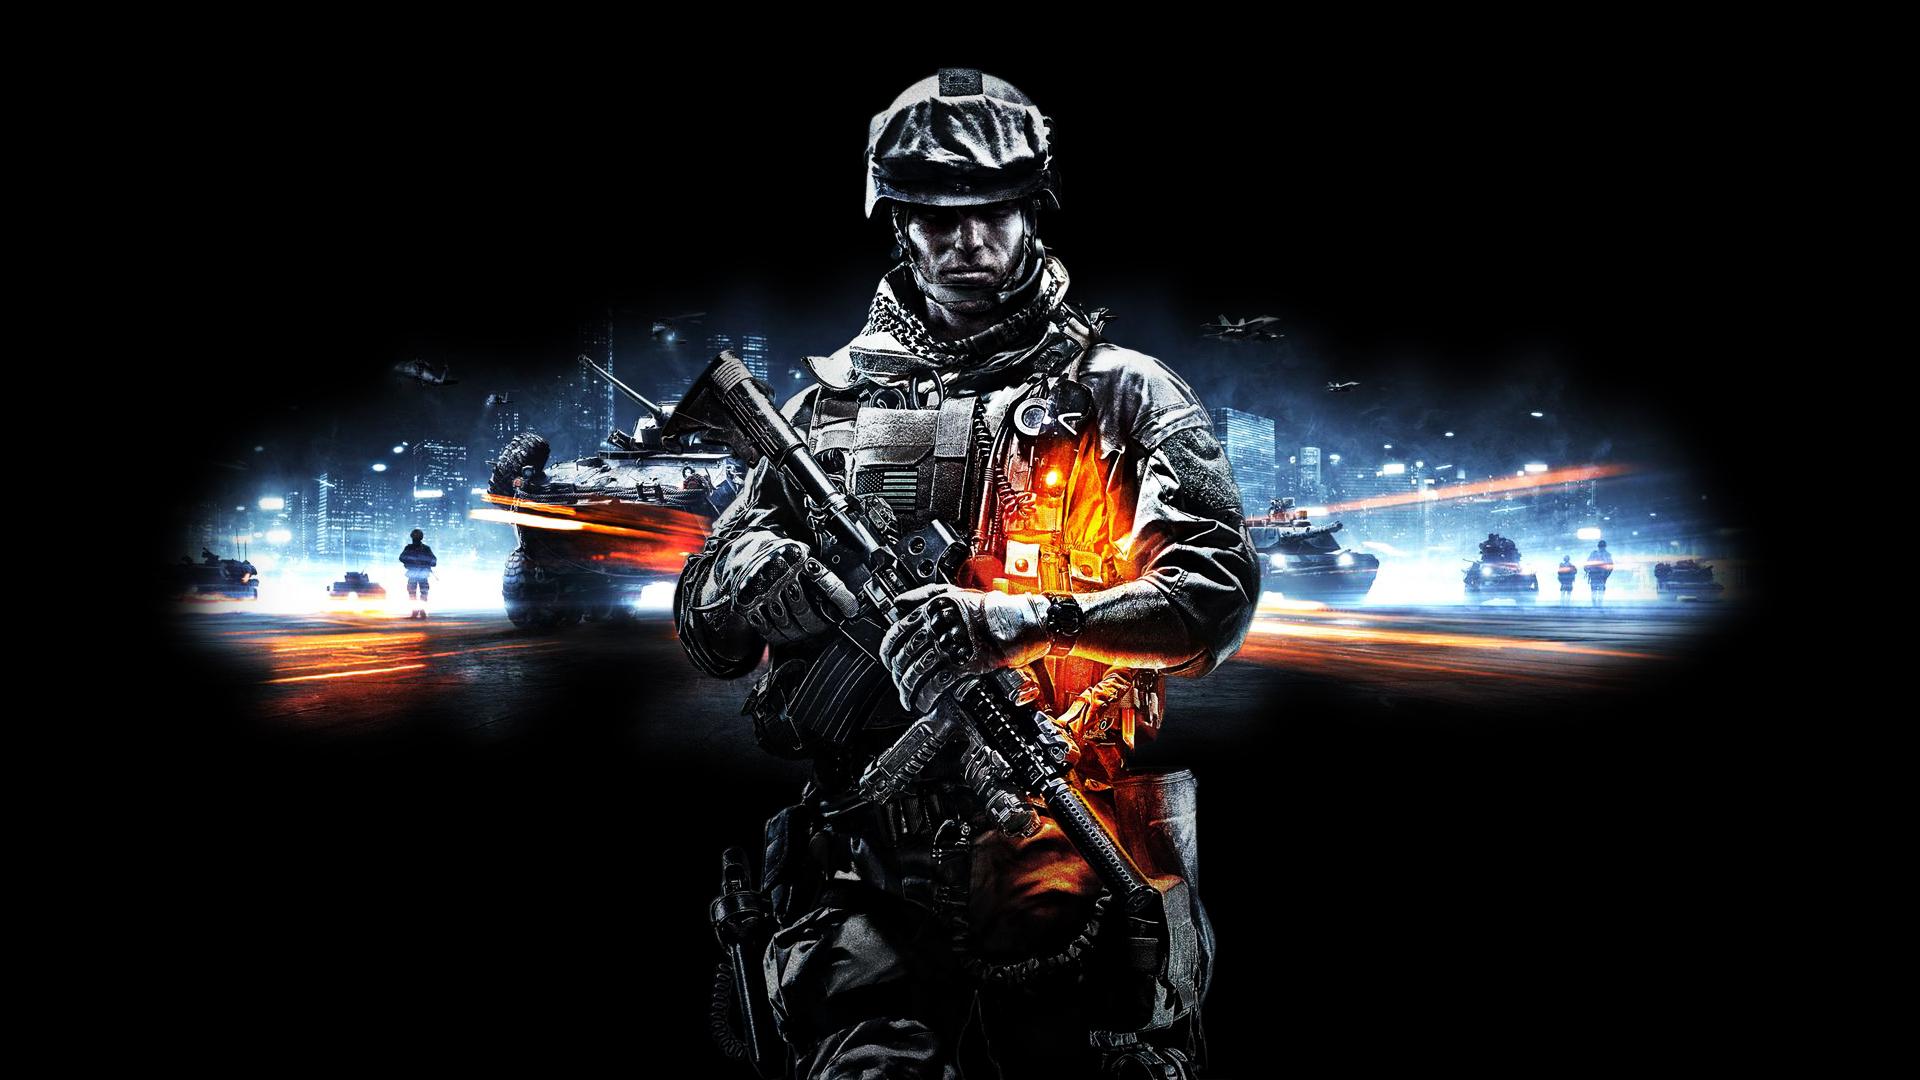 Battlefield 3 Wallpaper 1920x1080 Battlefield 3 1920x1080